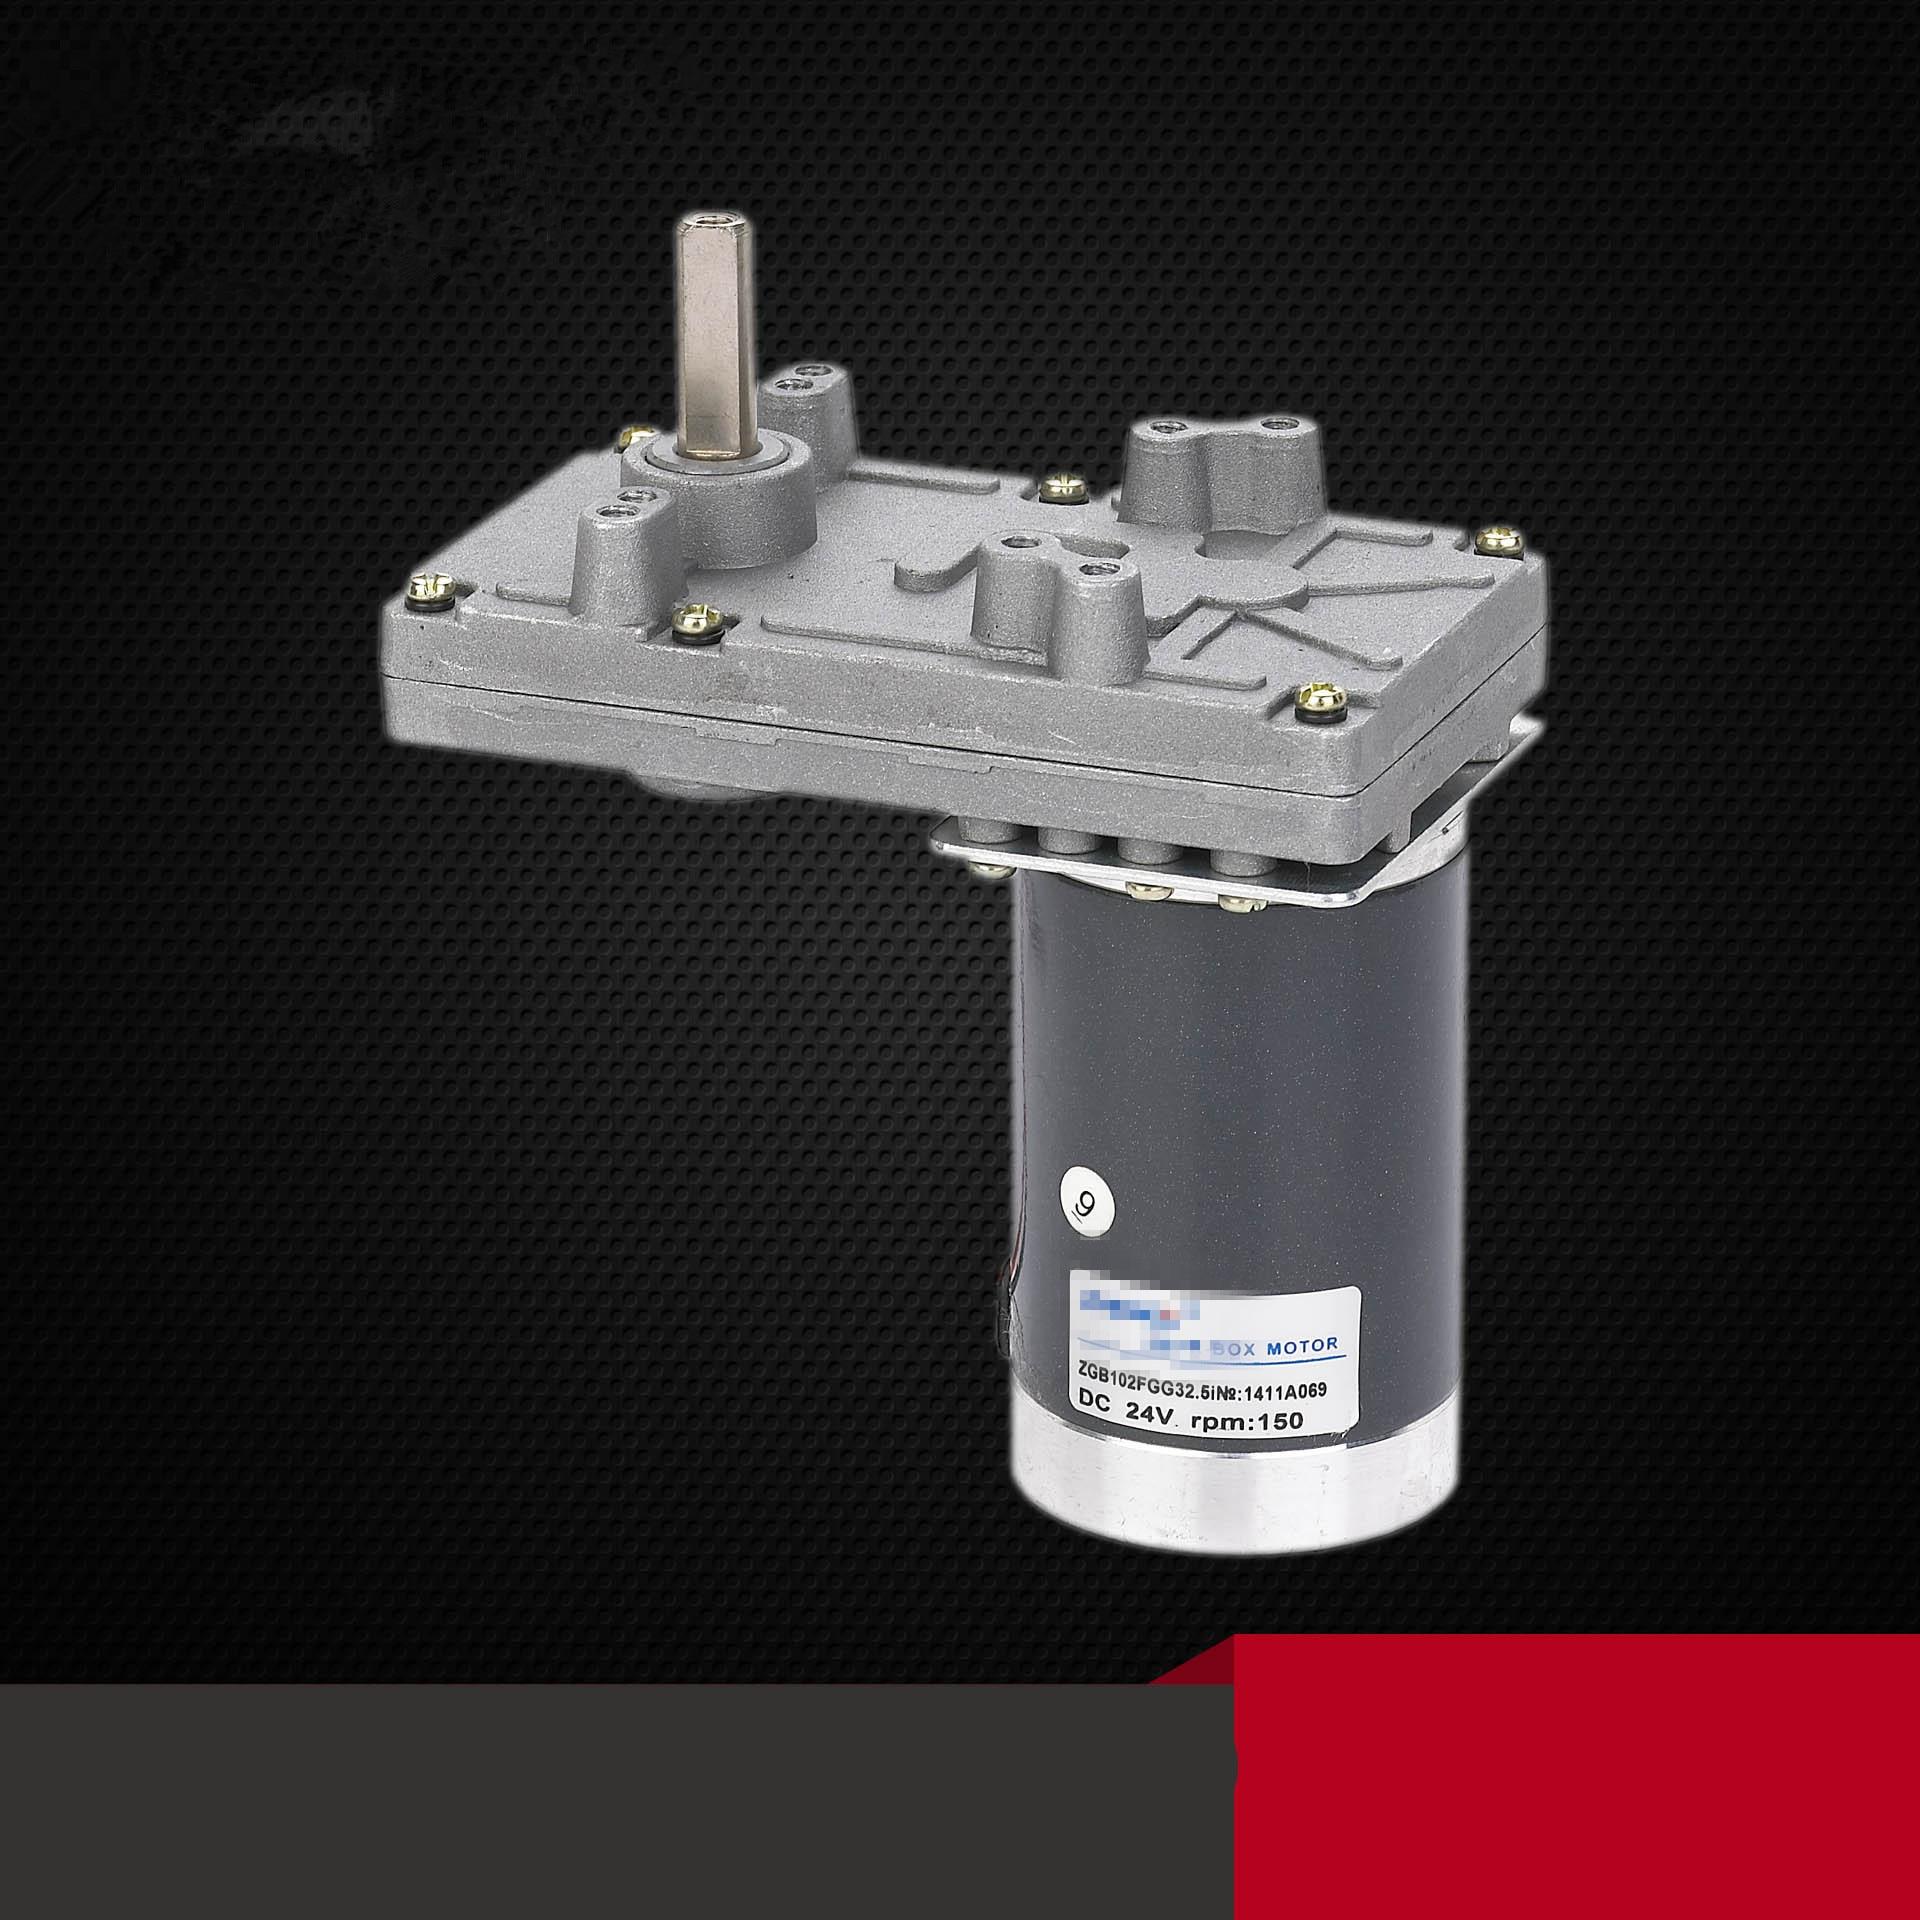 цена на ZGB102FGG 12V 24V DC Geared Motor Output Shaft Eccentric 4-120RPM